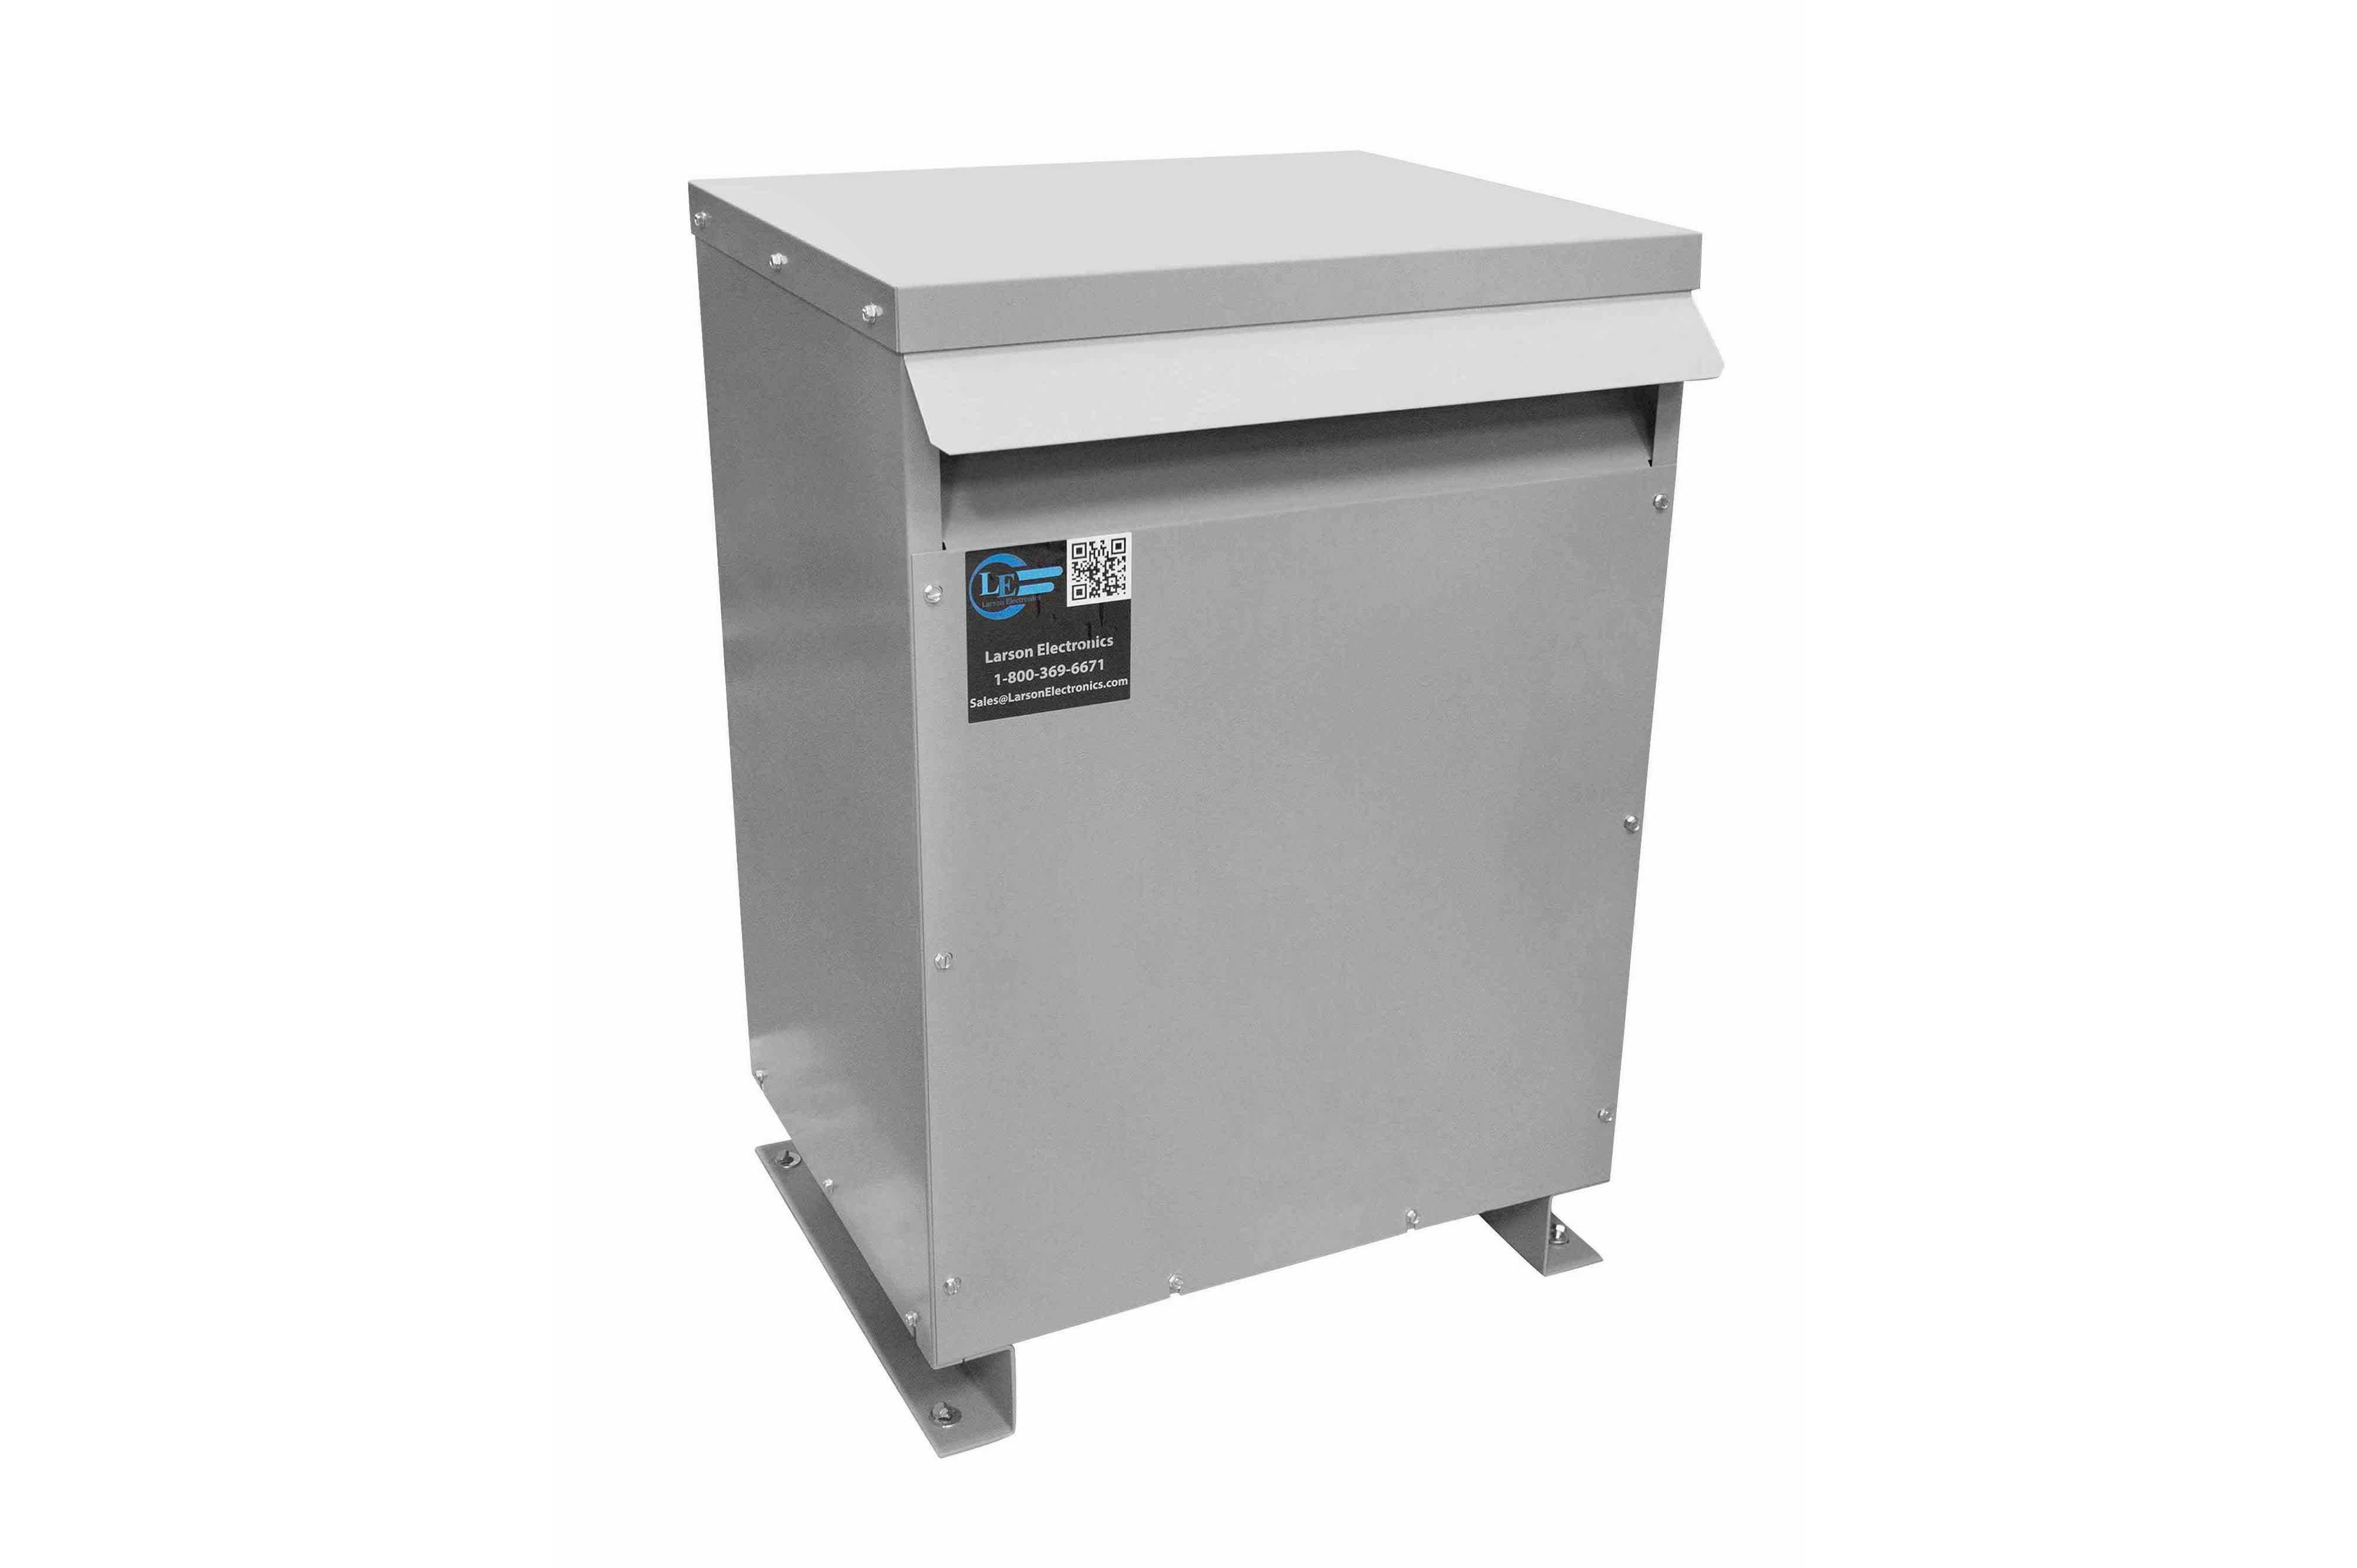 110 kVA 3PH Isolation Transformer, 600V Wye Primary, 208Y/120 Wye-N Secondary, N3R, Ventilated, 60 Hz